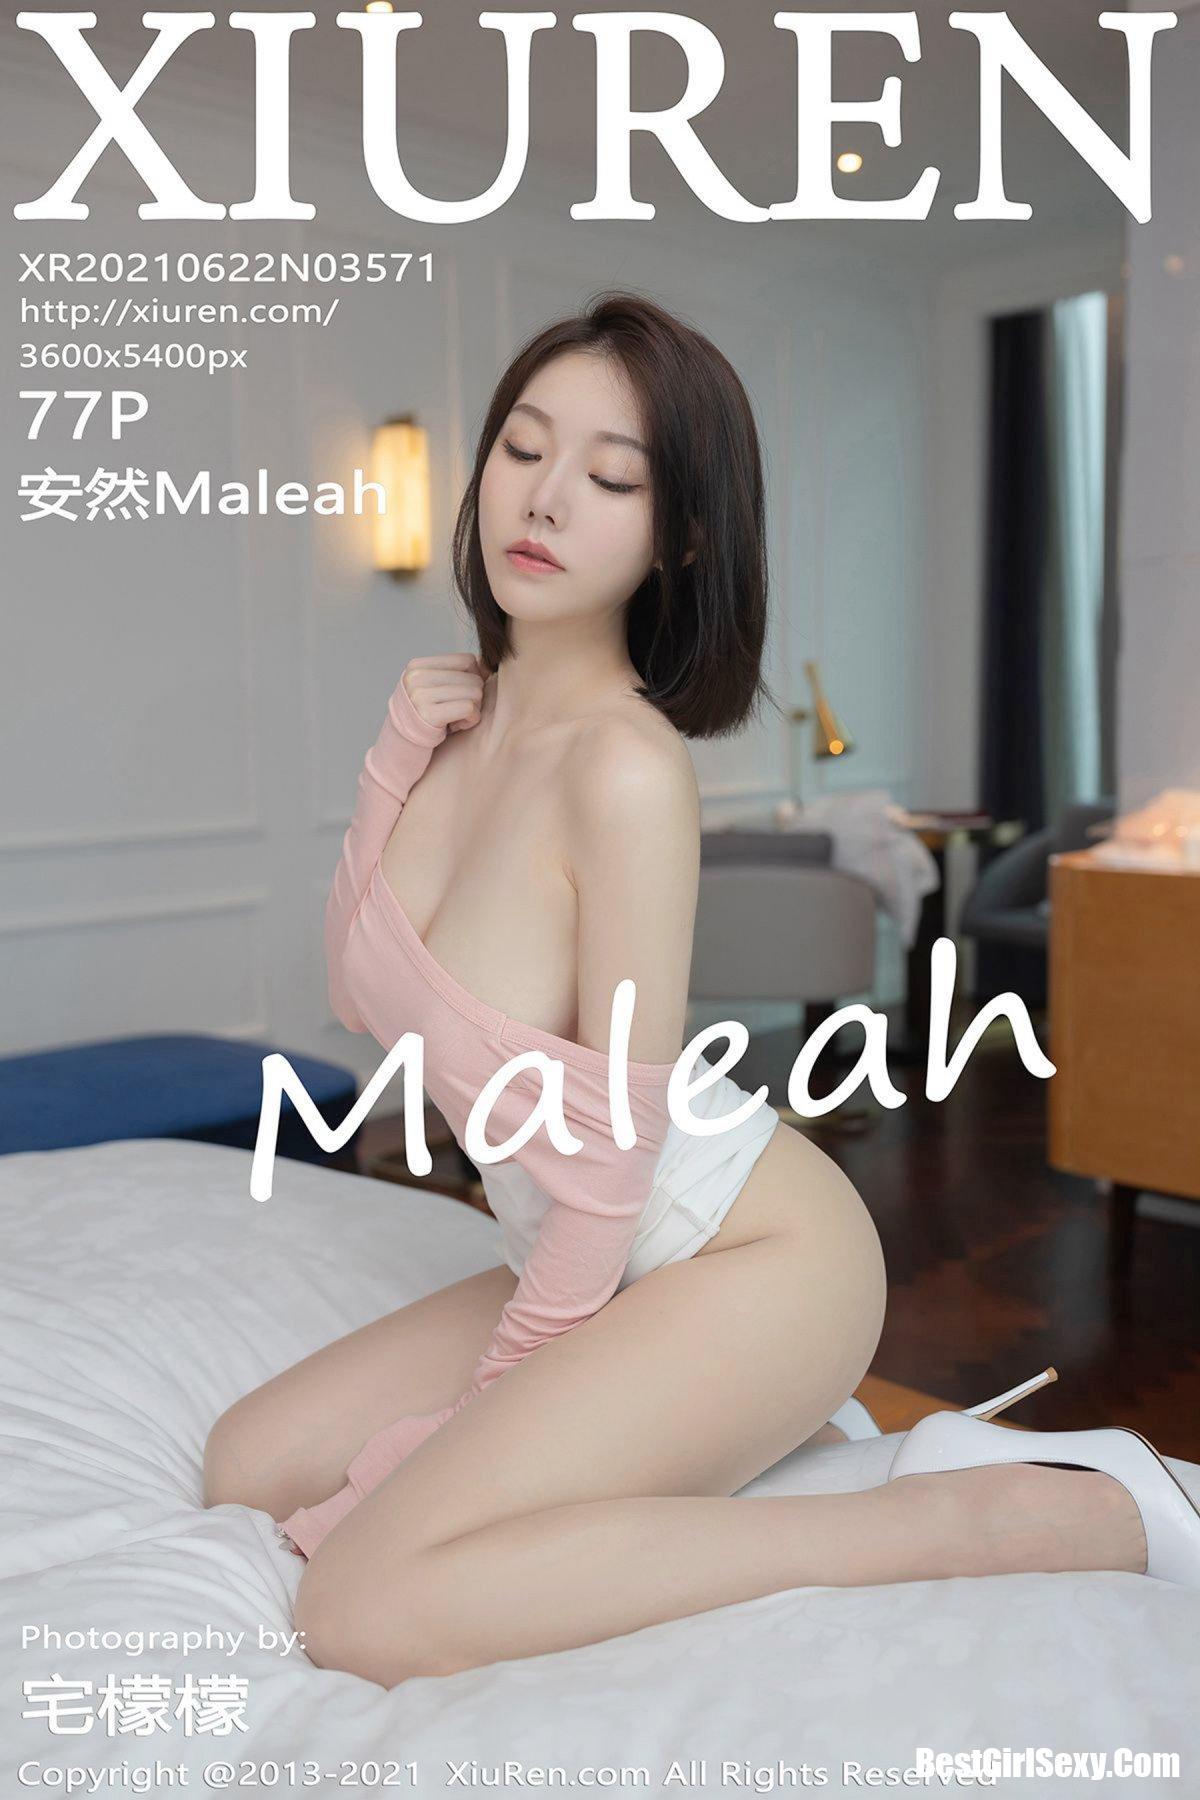 XiuRen秀人网 No.3571 An Ran Maleah 317